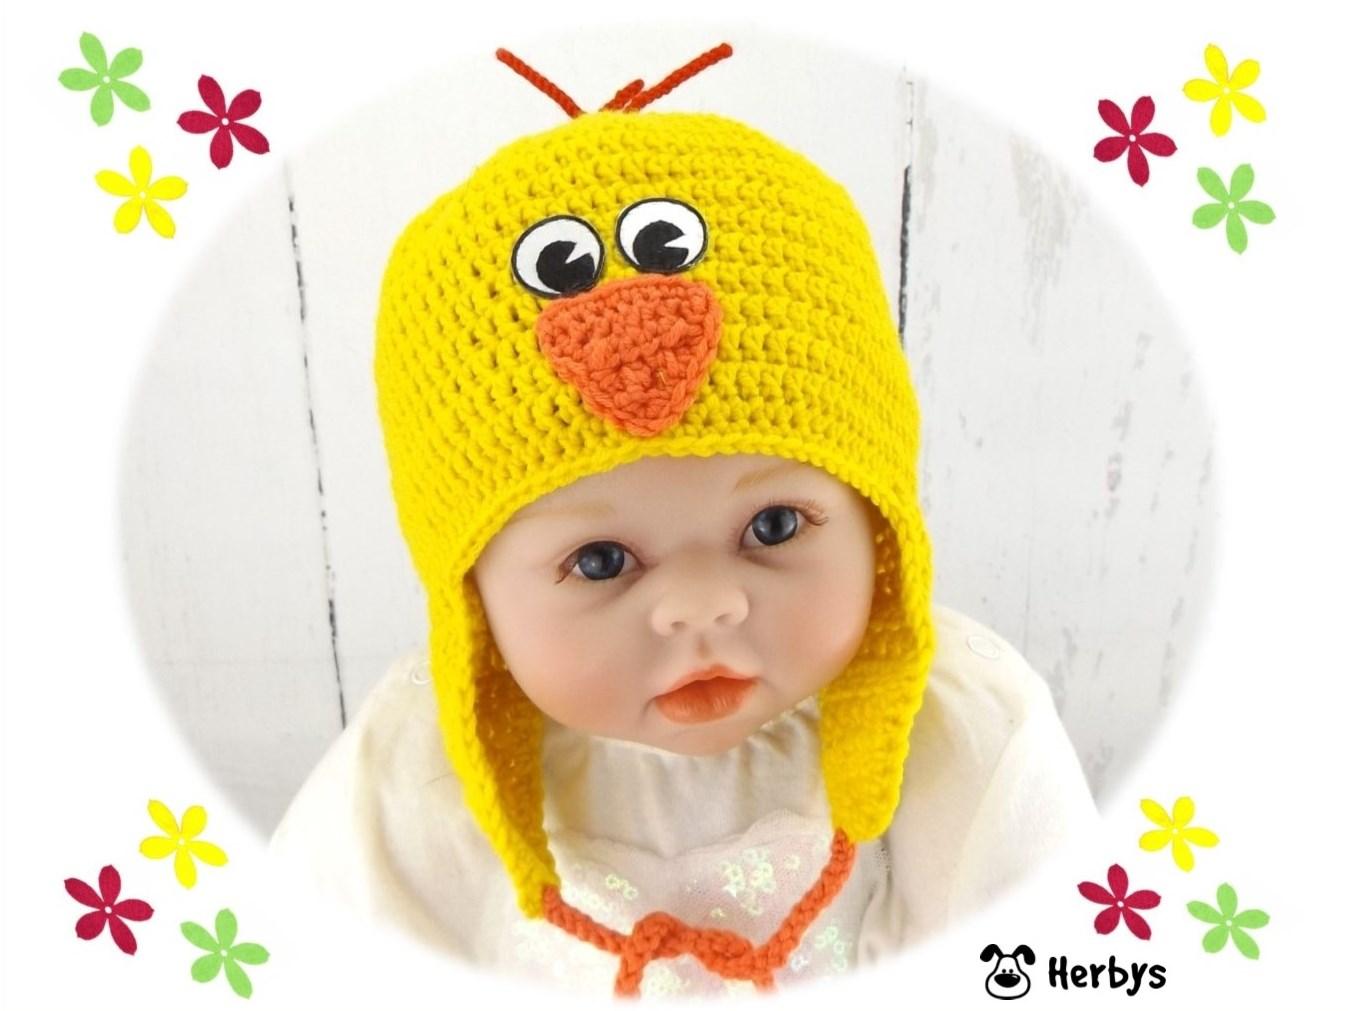 Herbys-Trendartikel - Häkelanleitung Babymütze